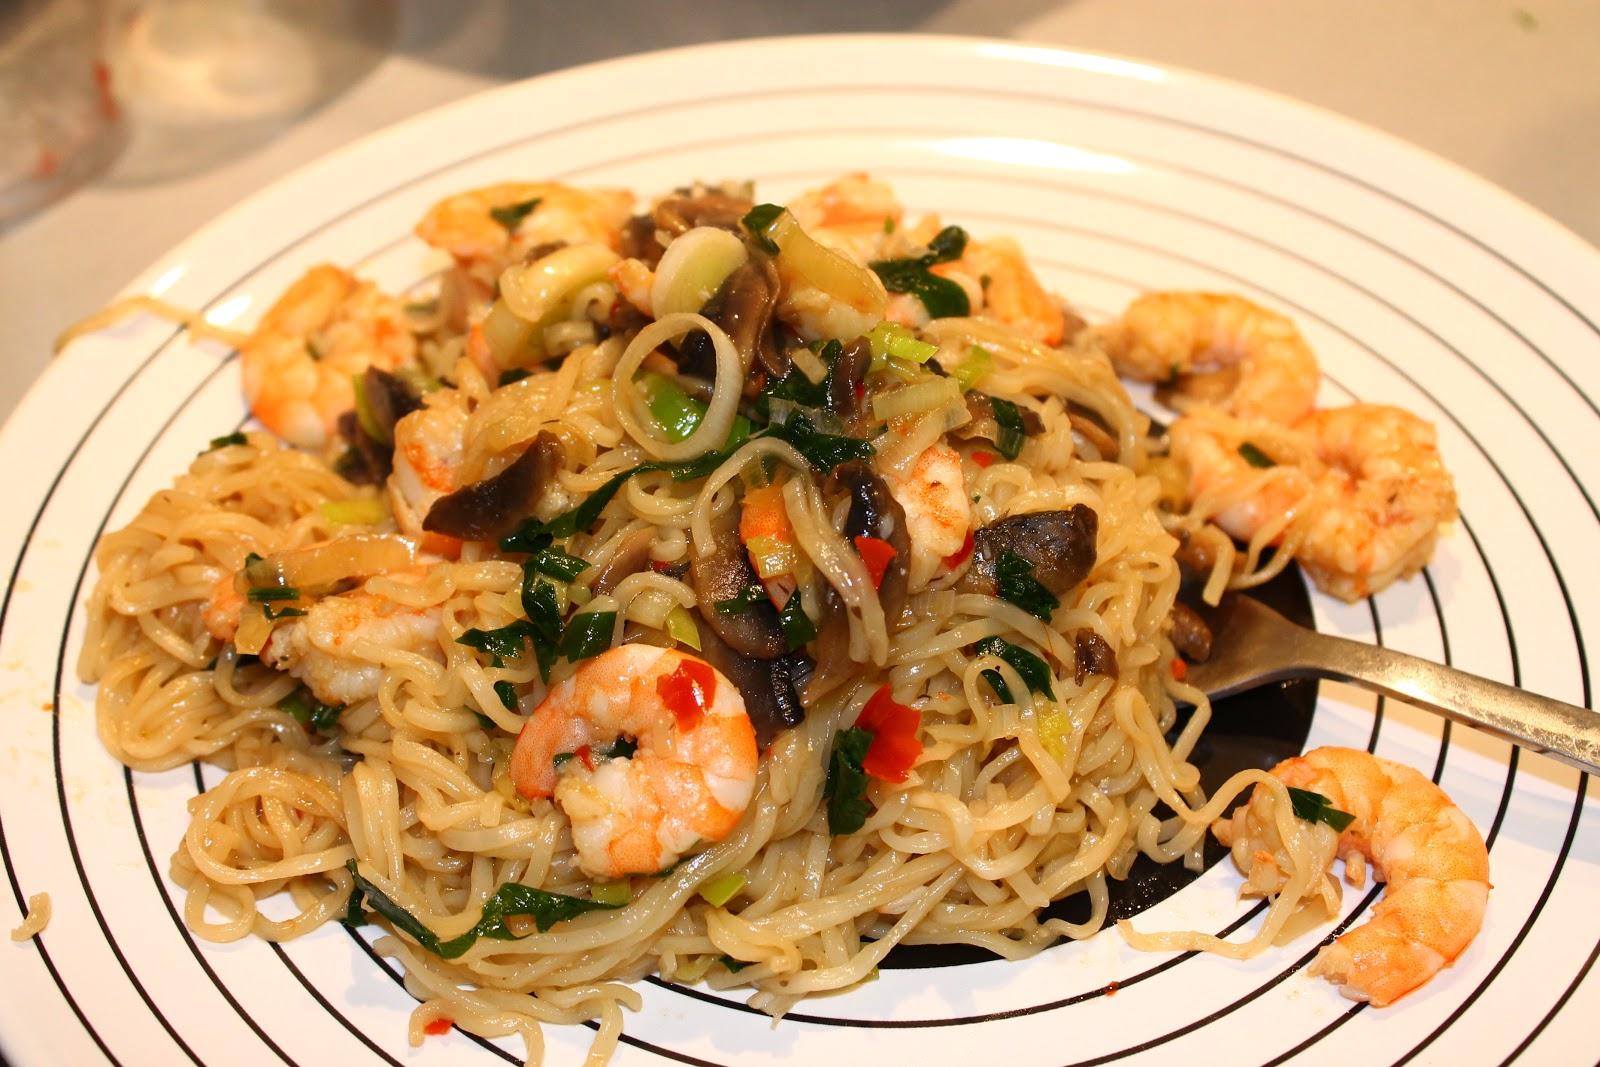 Crevettes et champignons sauce piquante